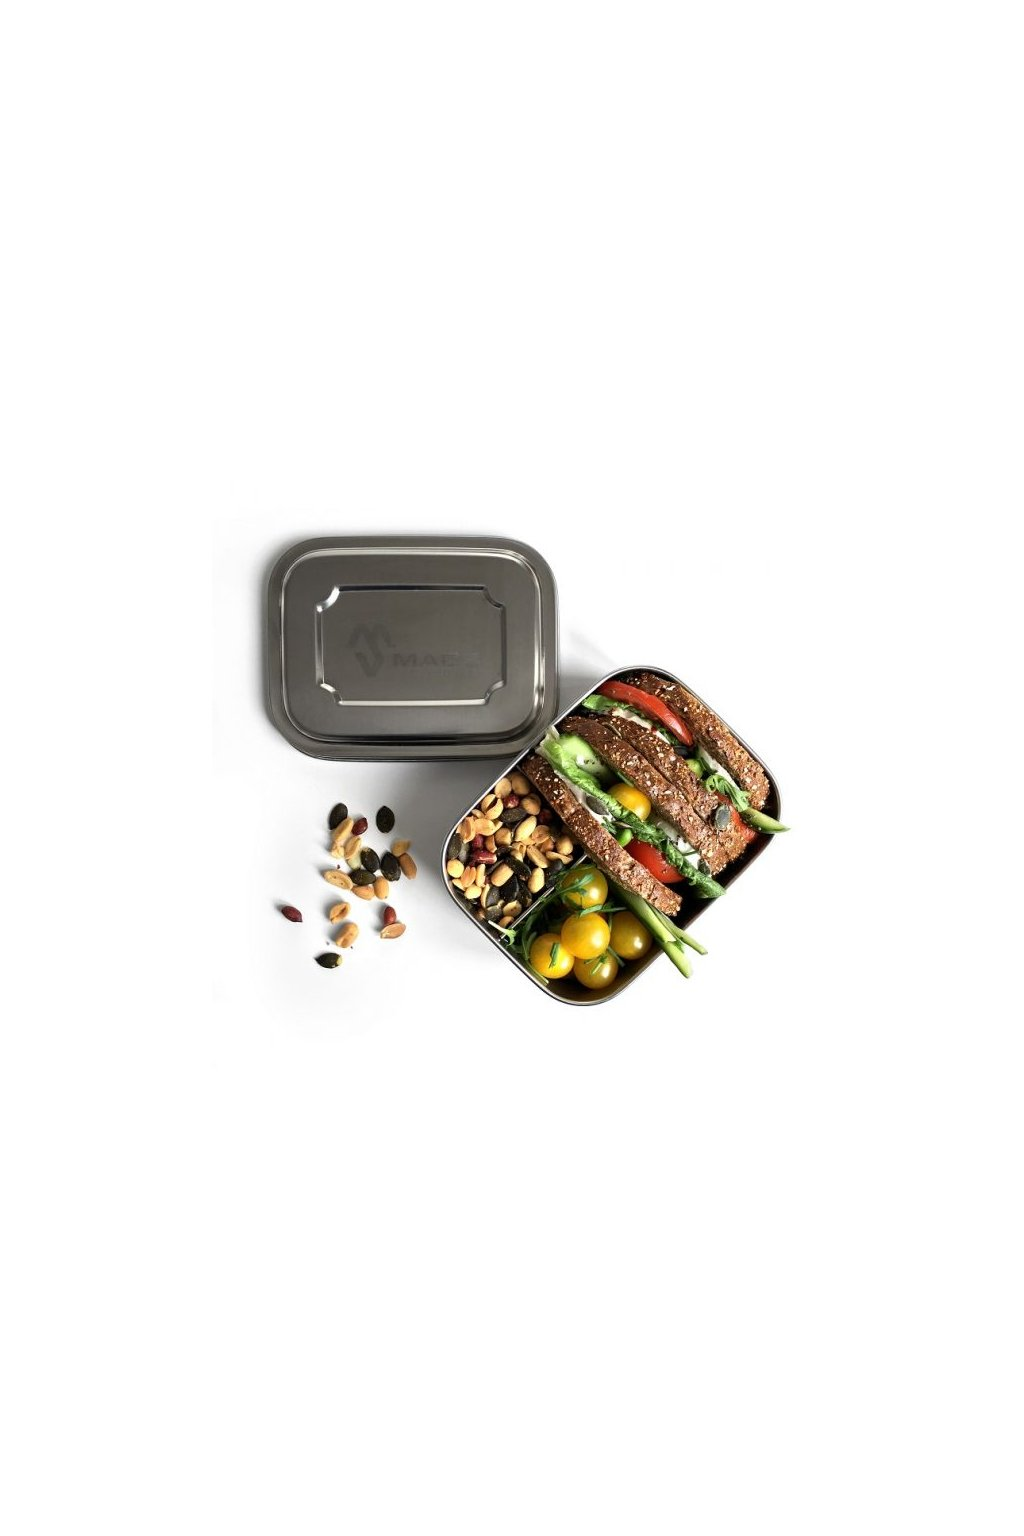 Made Sustained Medium Trio with Food